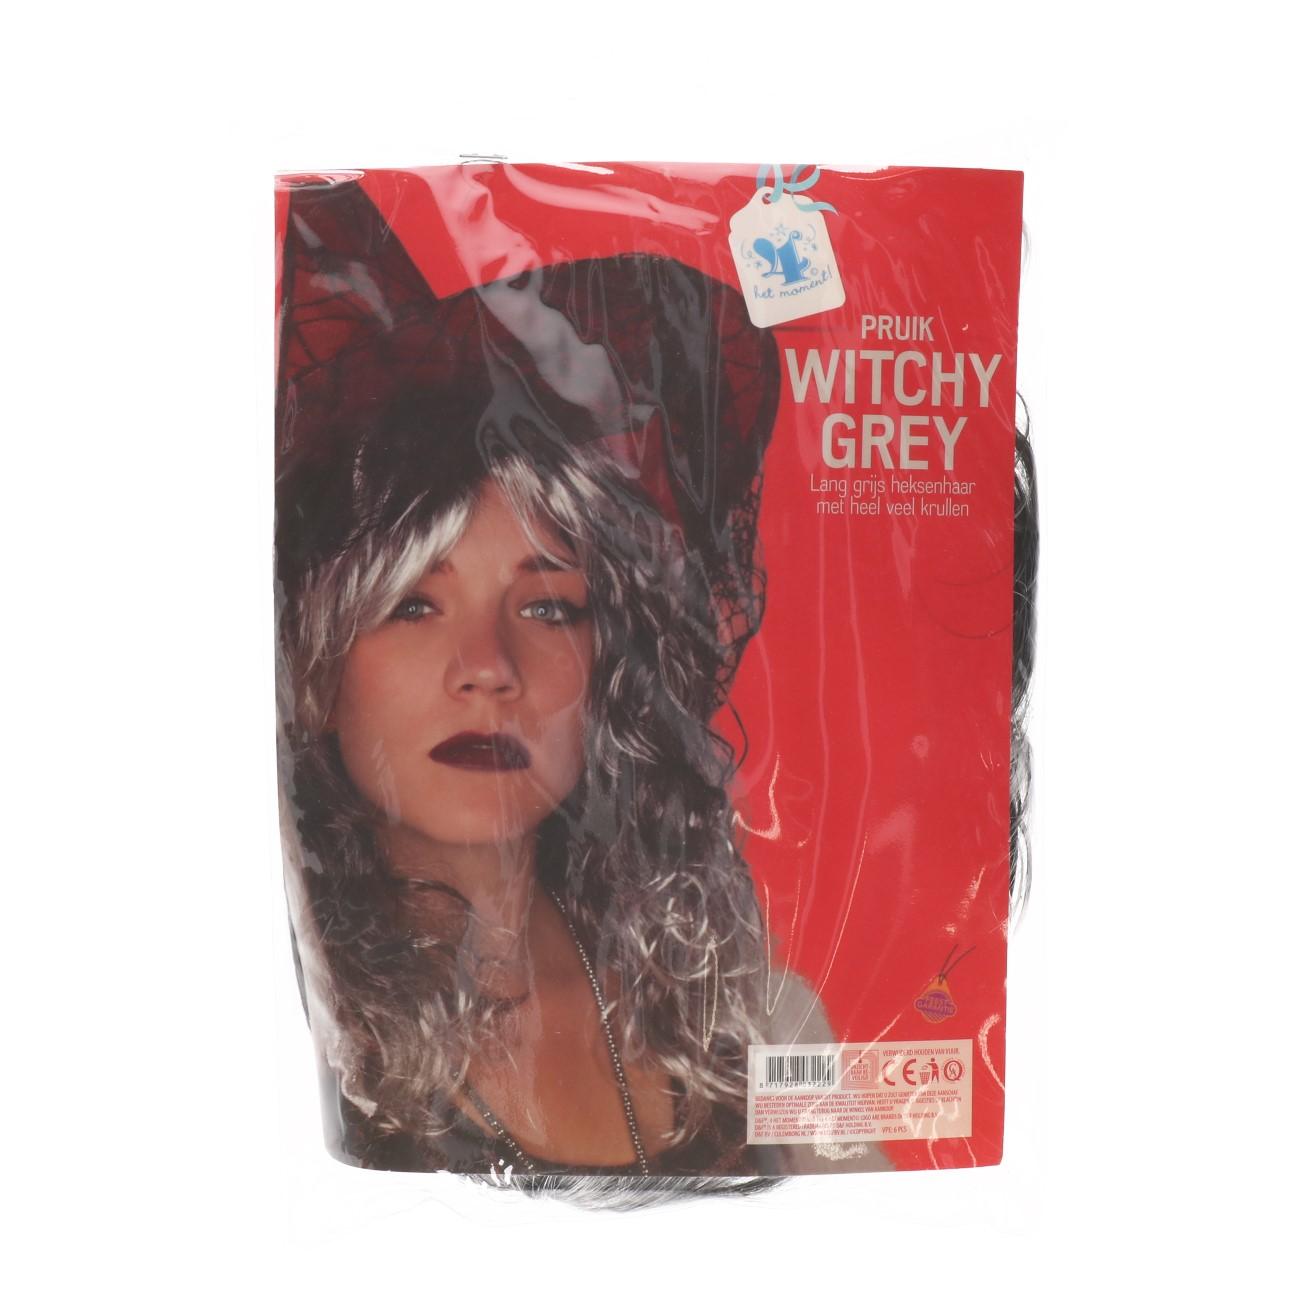 Pruik witchy grey